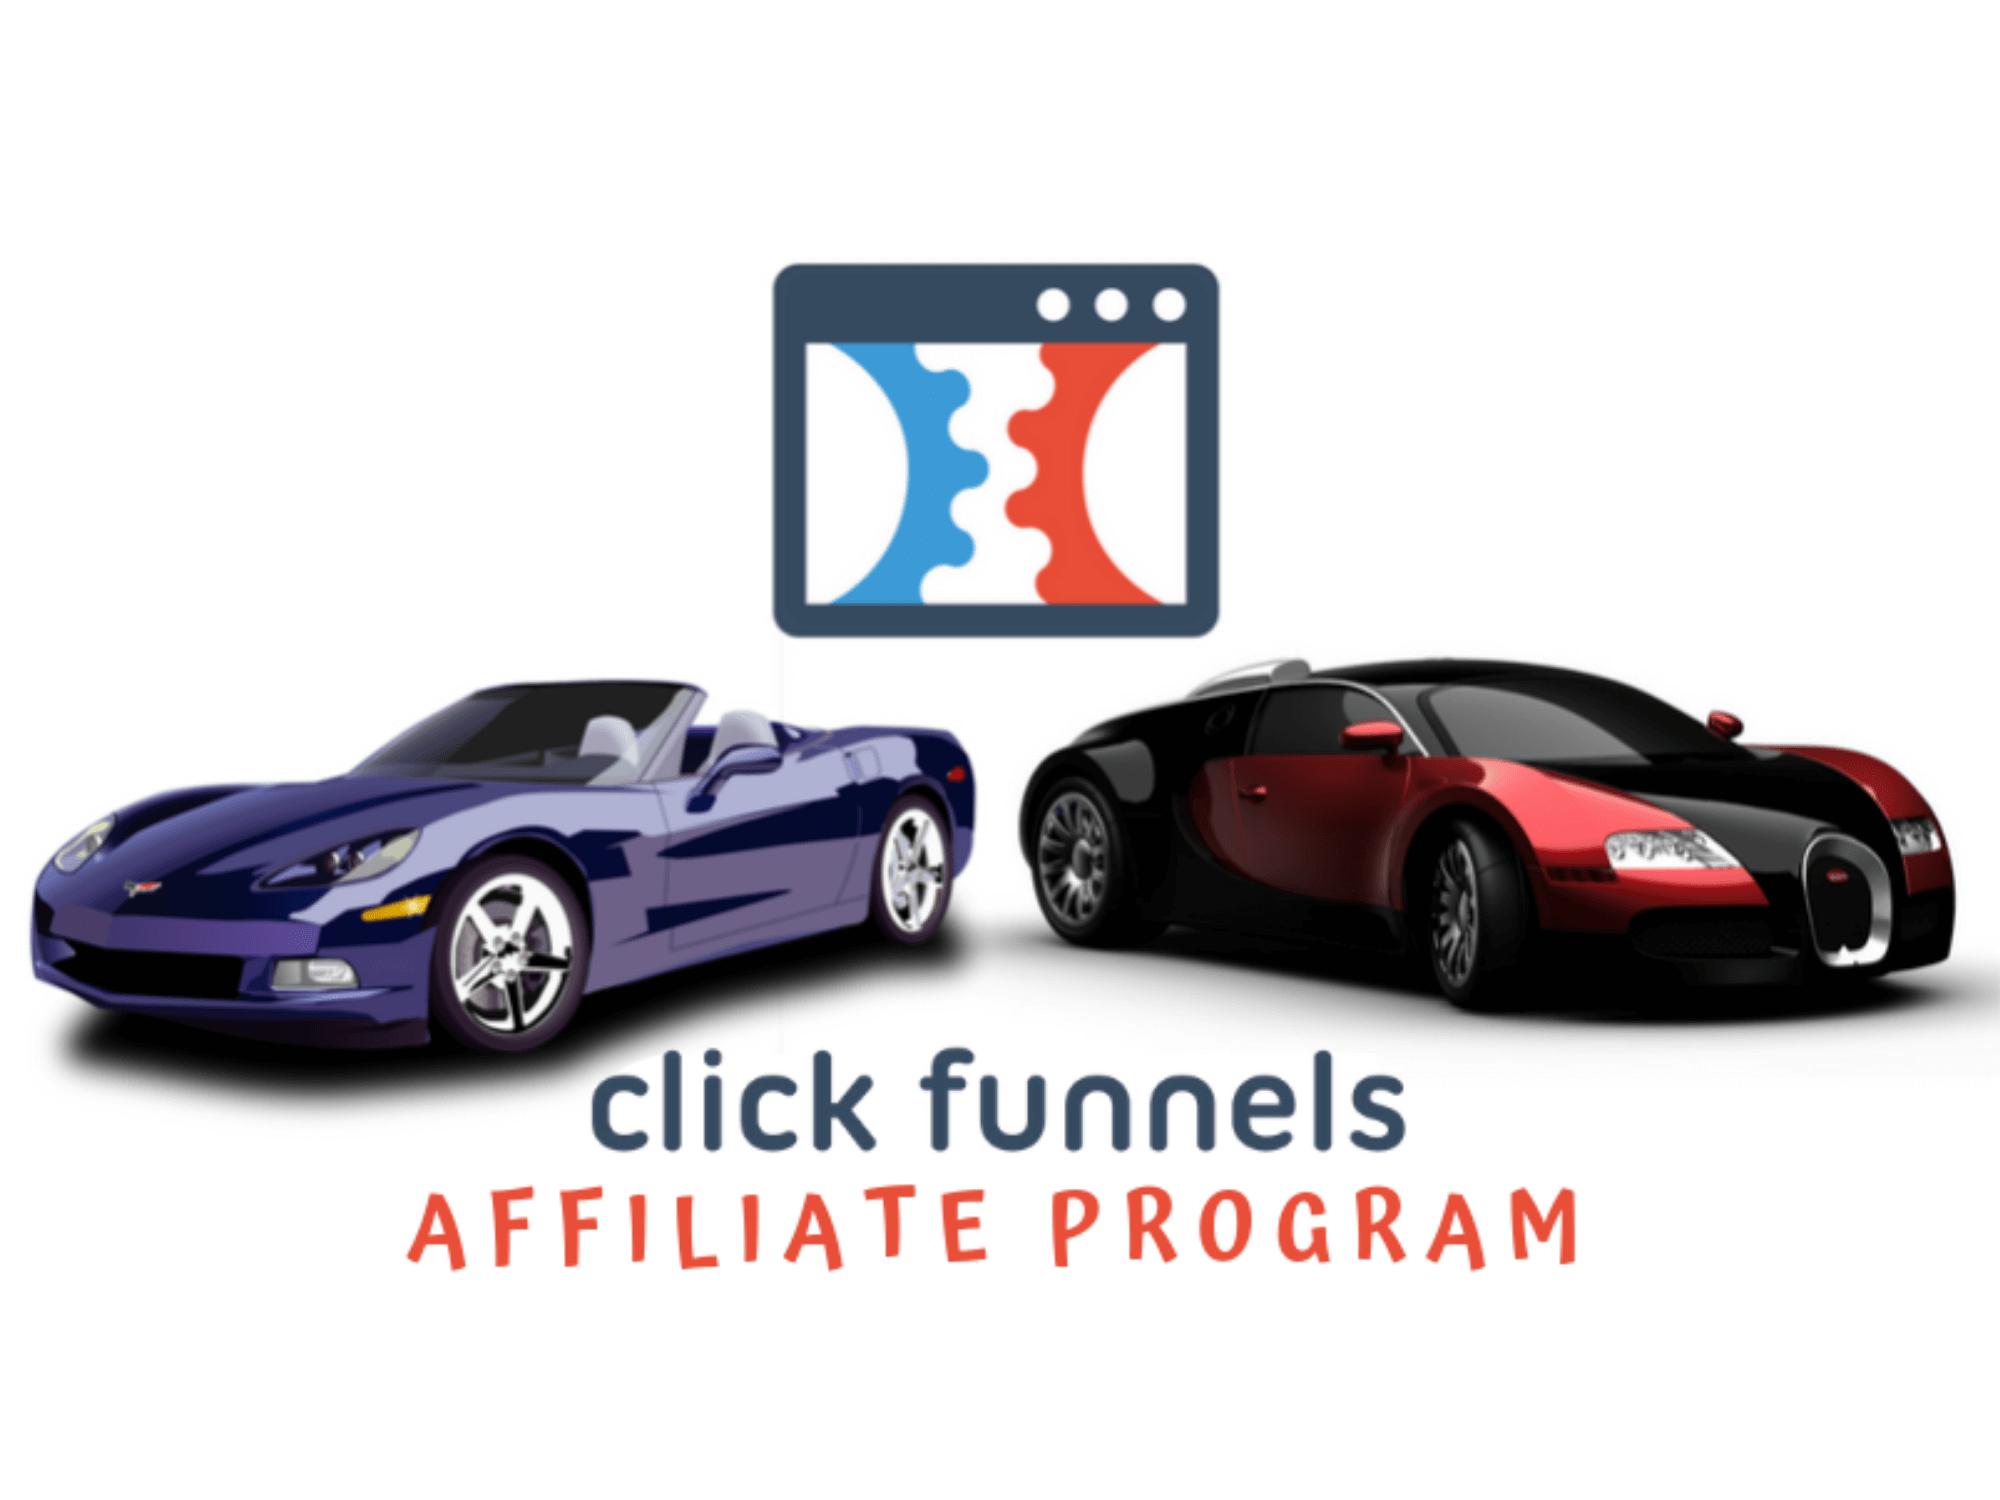 clickfunnels-affiliate-program-top-affiliate-programs